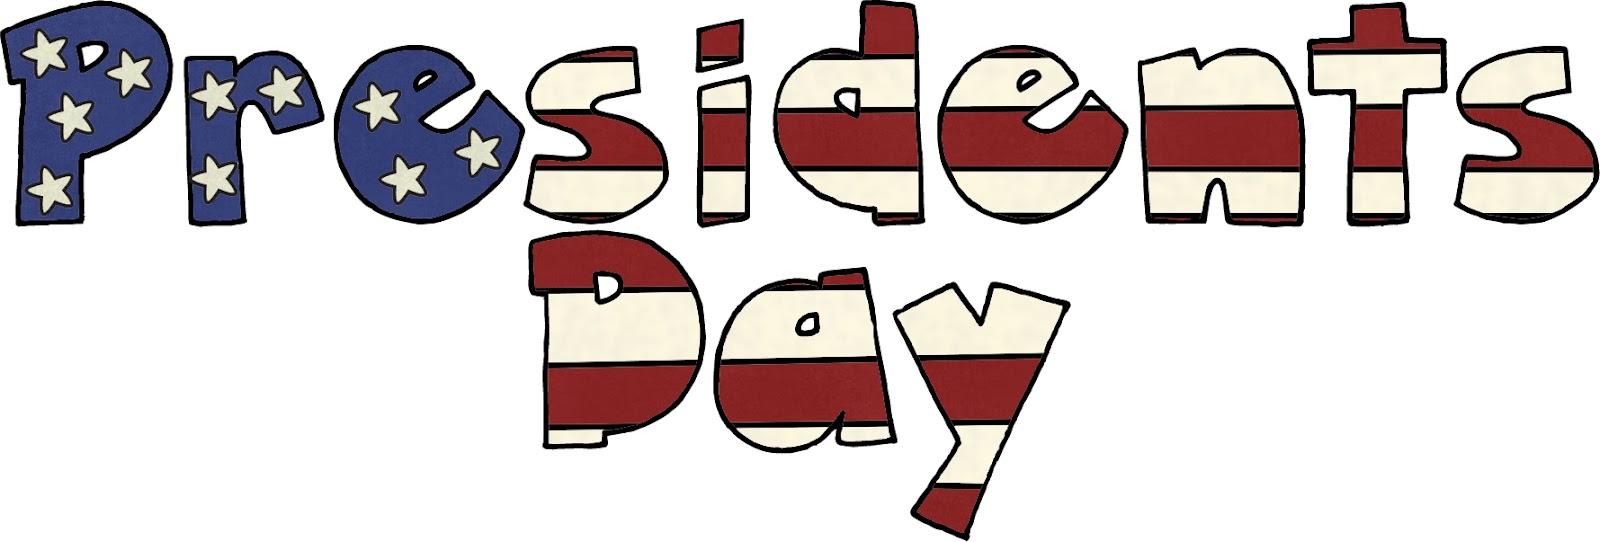 Happy Presidents Day Presiden - Presidents Day Clipart